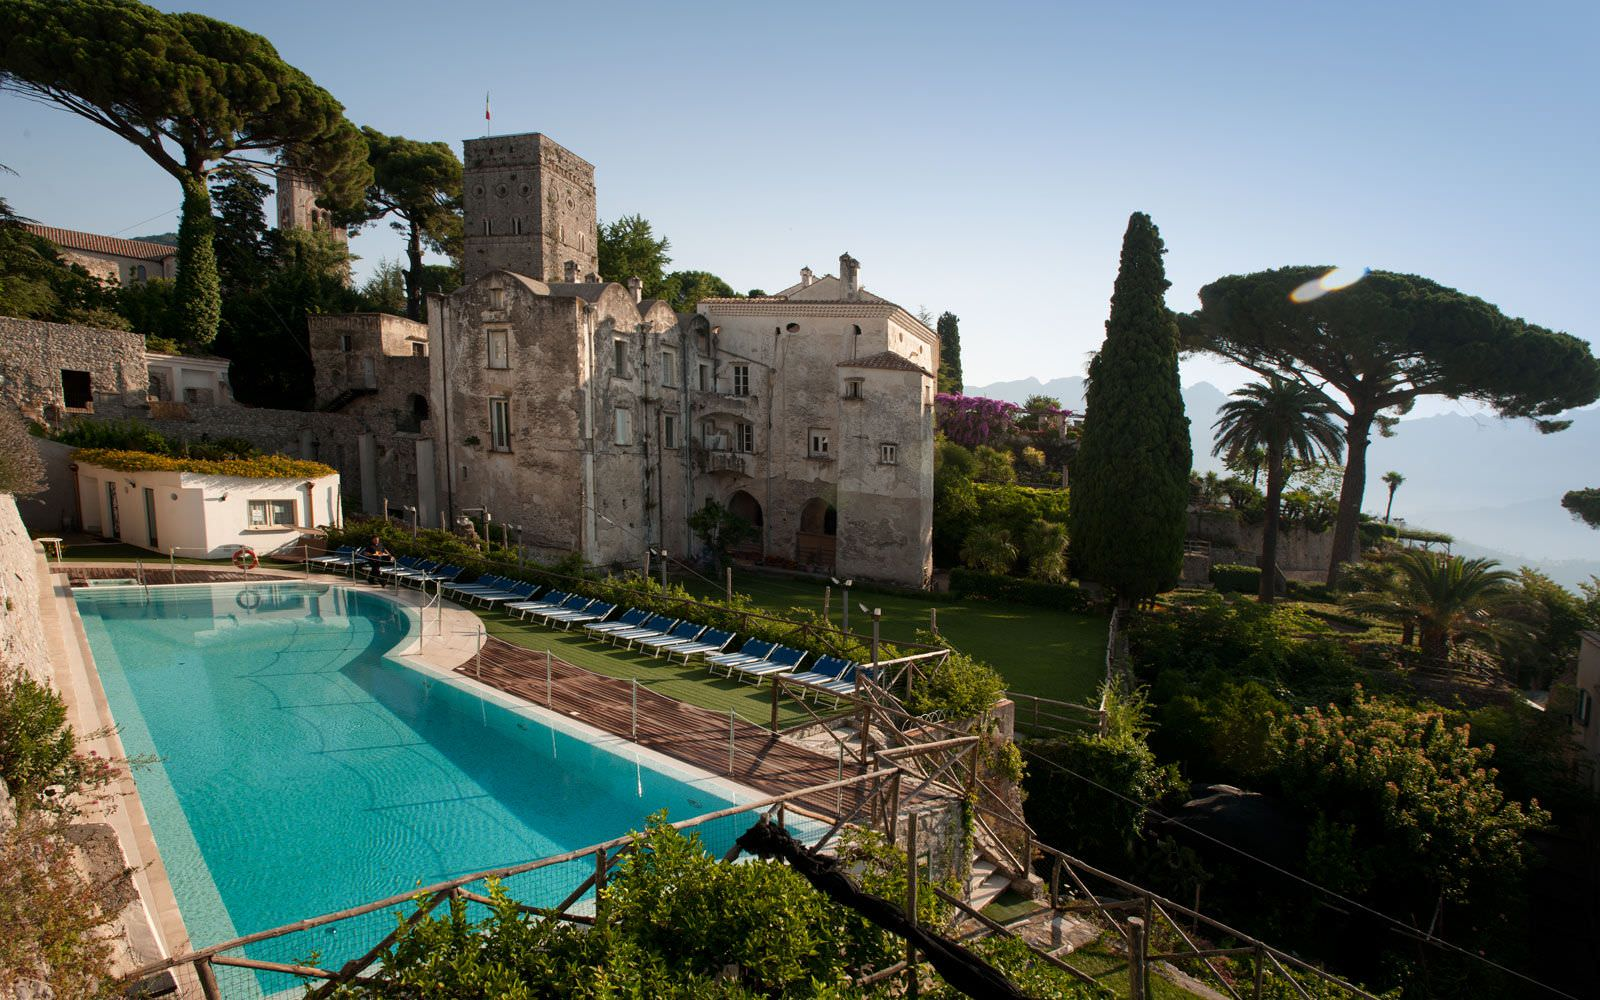 Ravello Charming Hotel Ravello Amalfi Coast Italy